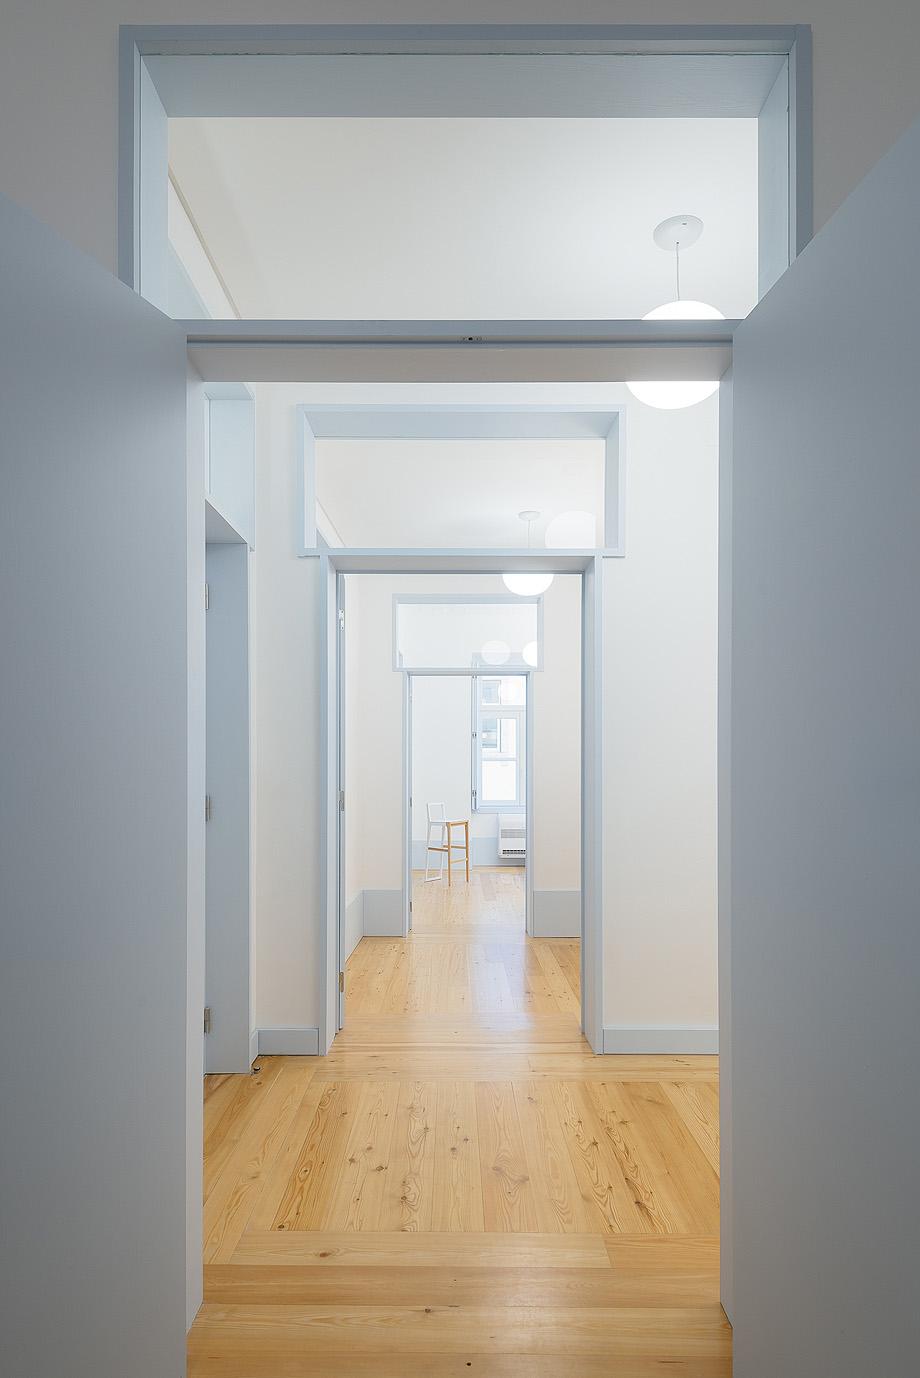 apartamentos pombalinos de aurora arquitectos - foto do mal o menos (14)